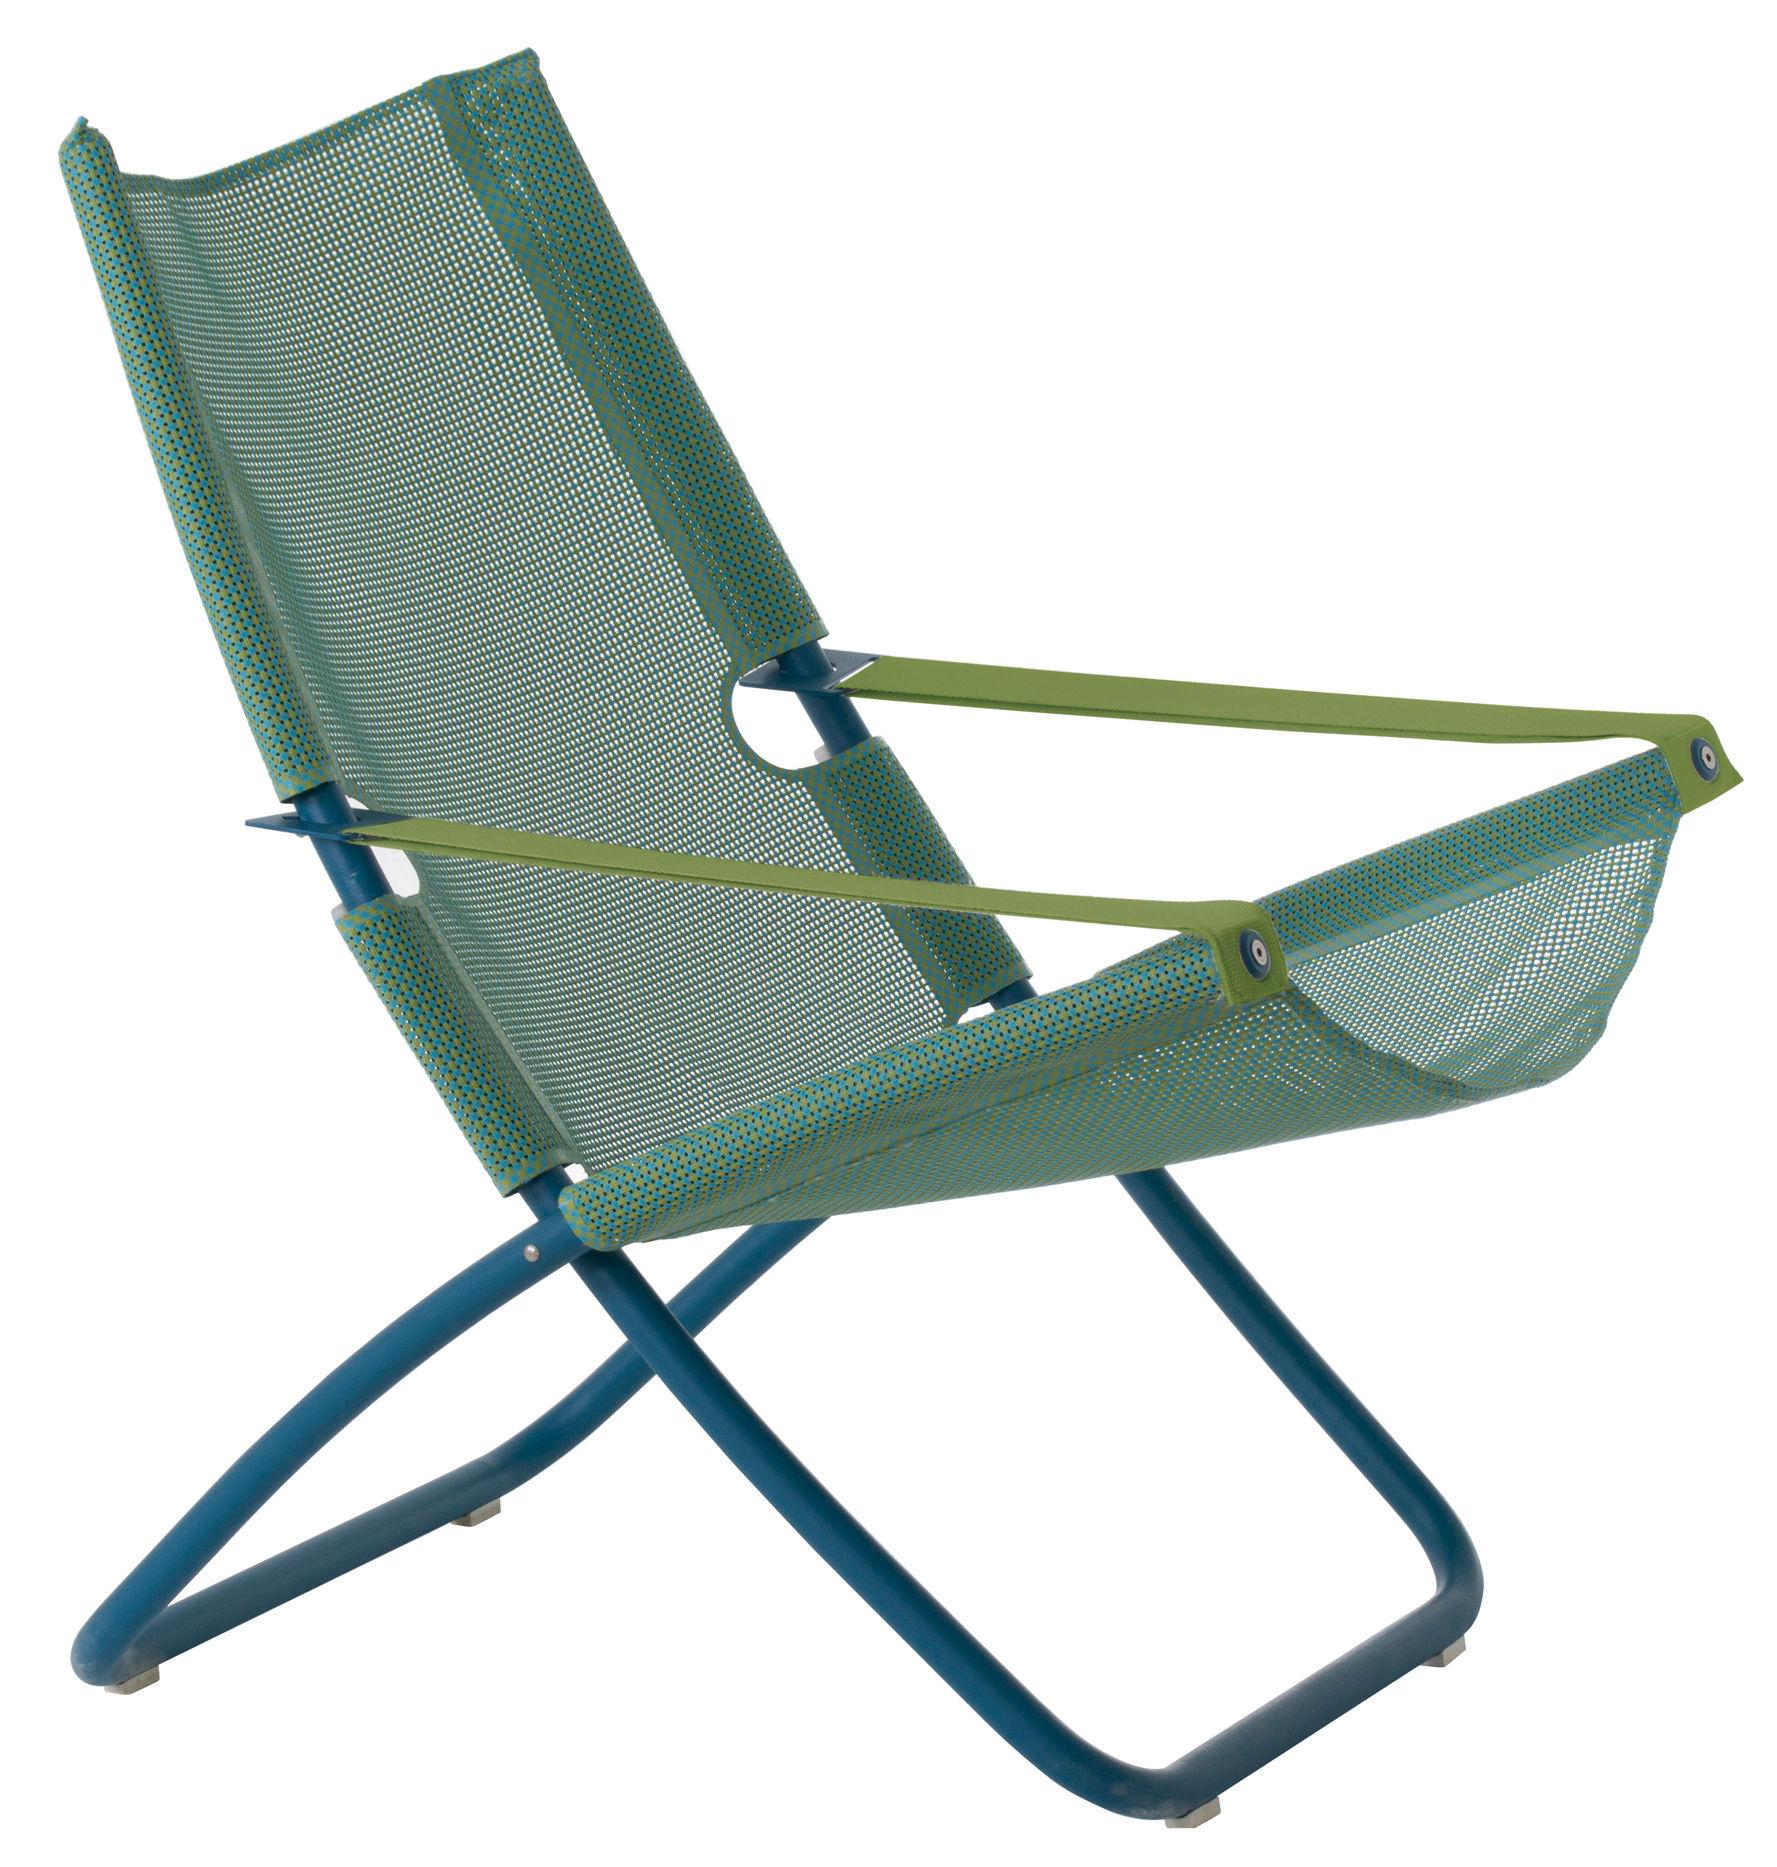 chaise longue snooze pliable 2 positions bleu emu. Black Bedroom Furniture Sets. Home Design Ideas